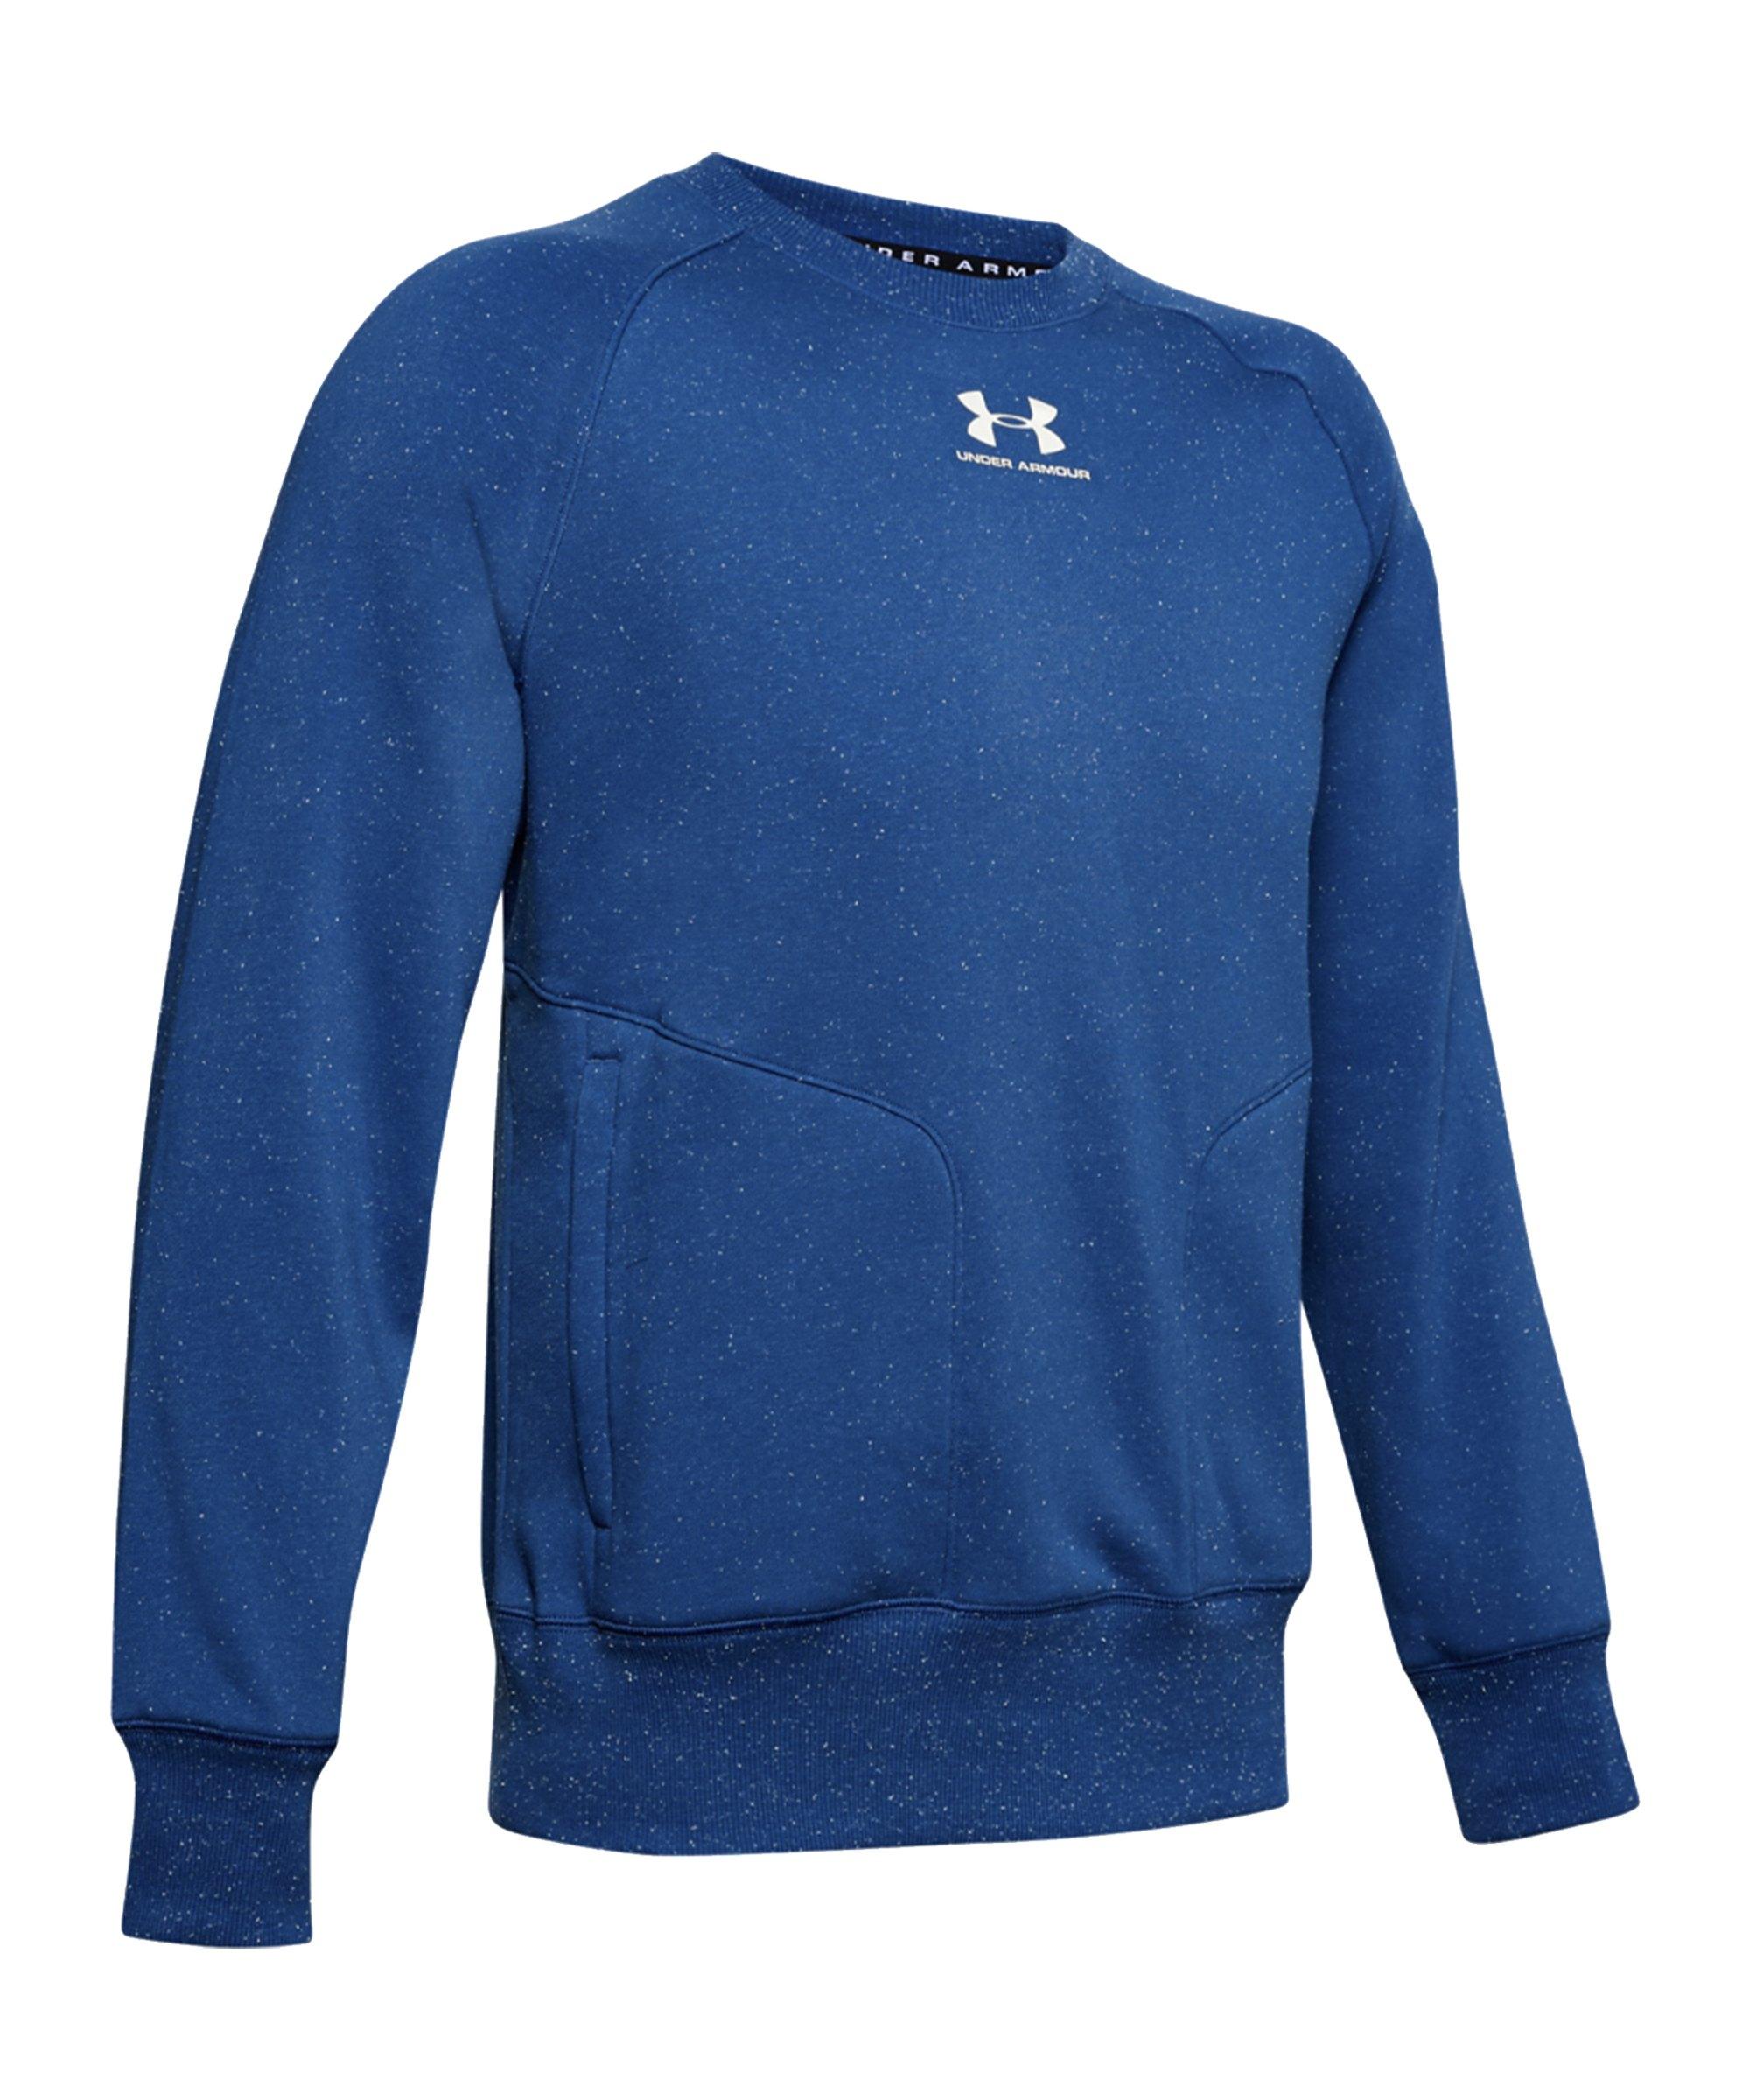 Under Armour Speckled Fleece Sweatshirt Blau F449 - blau